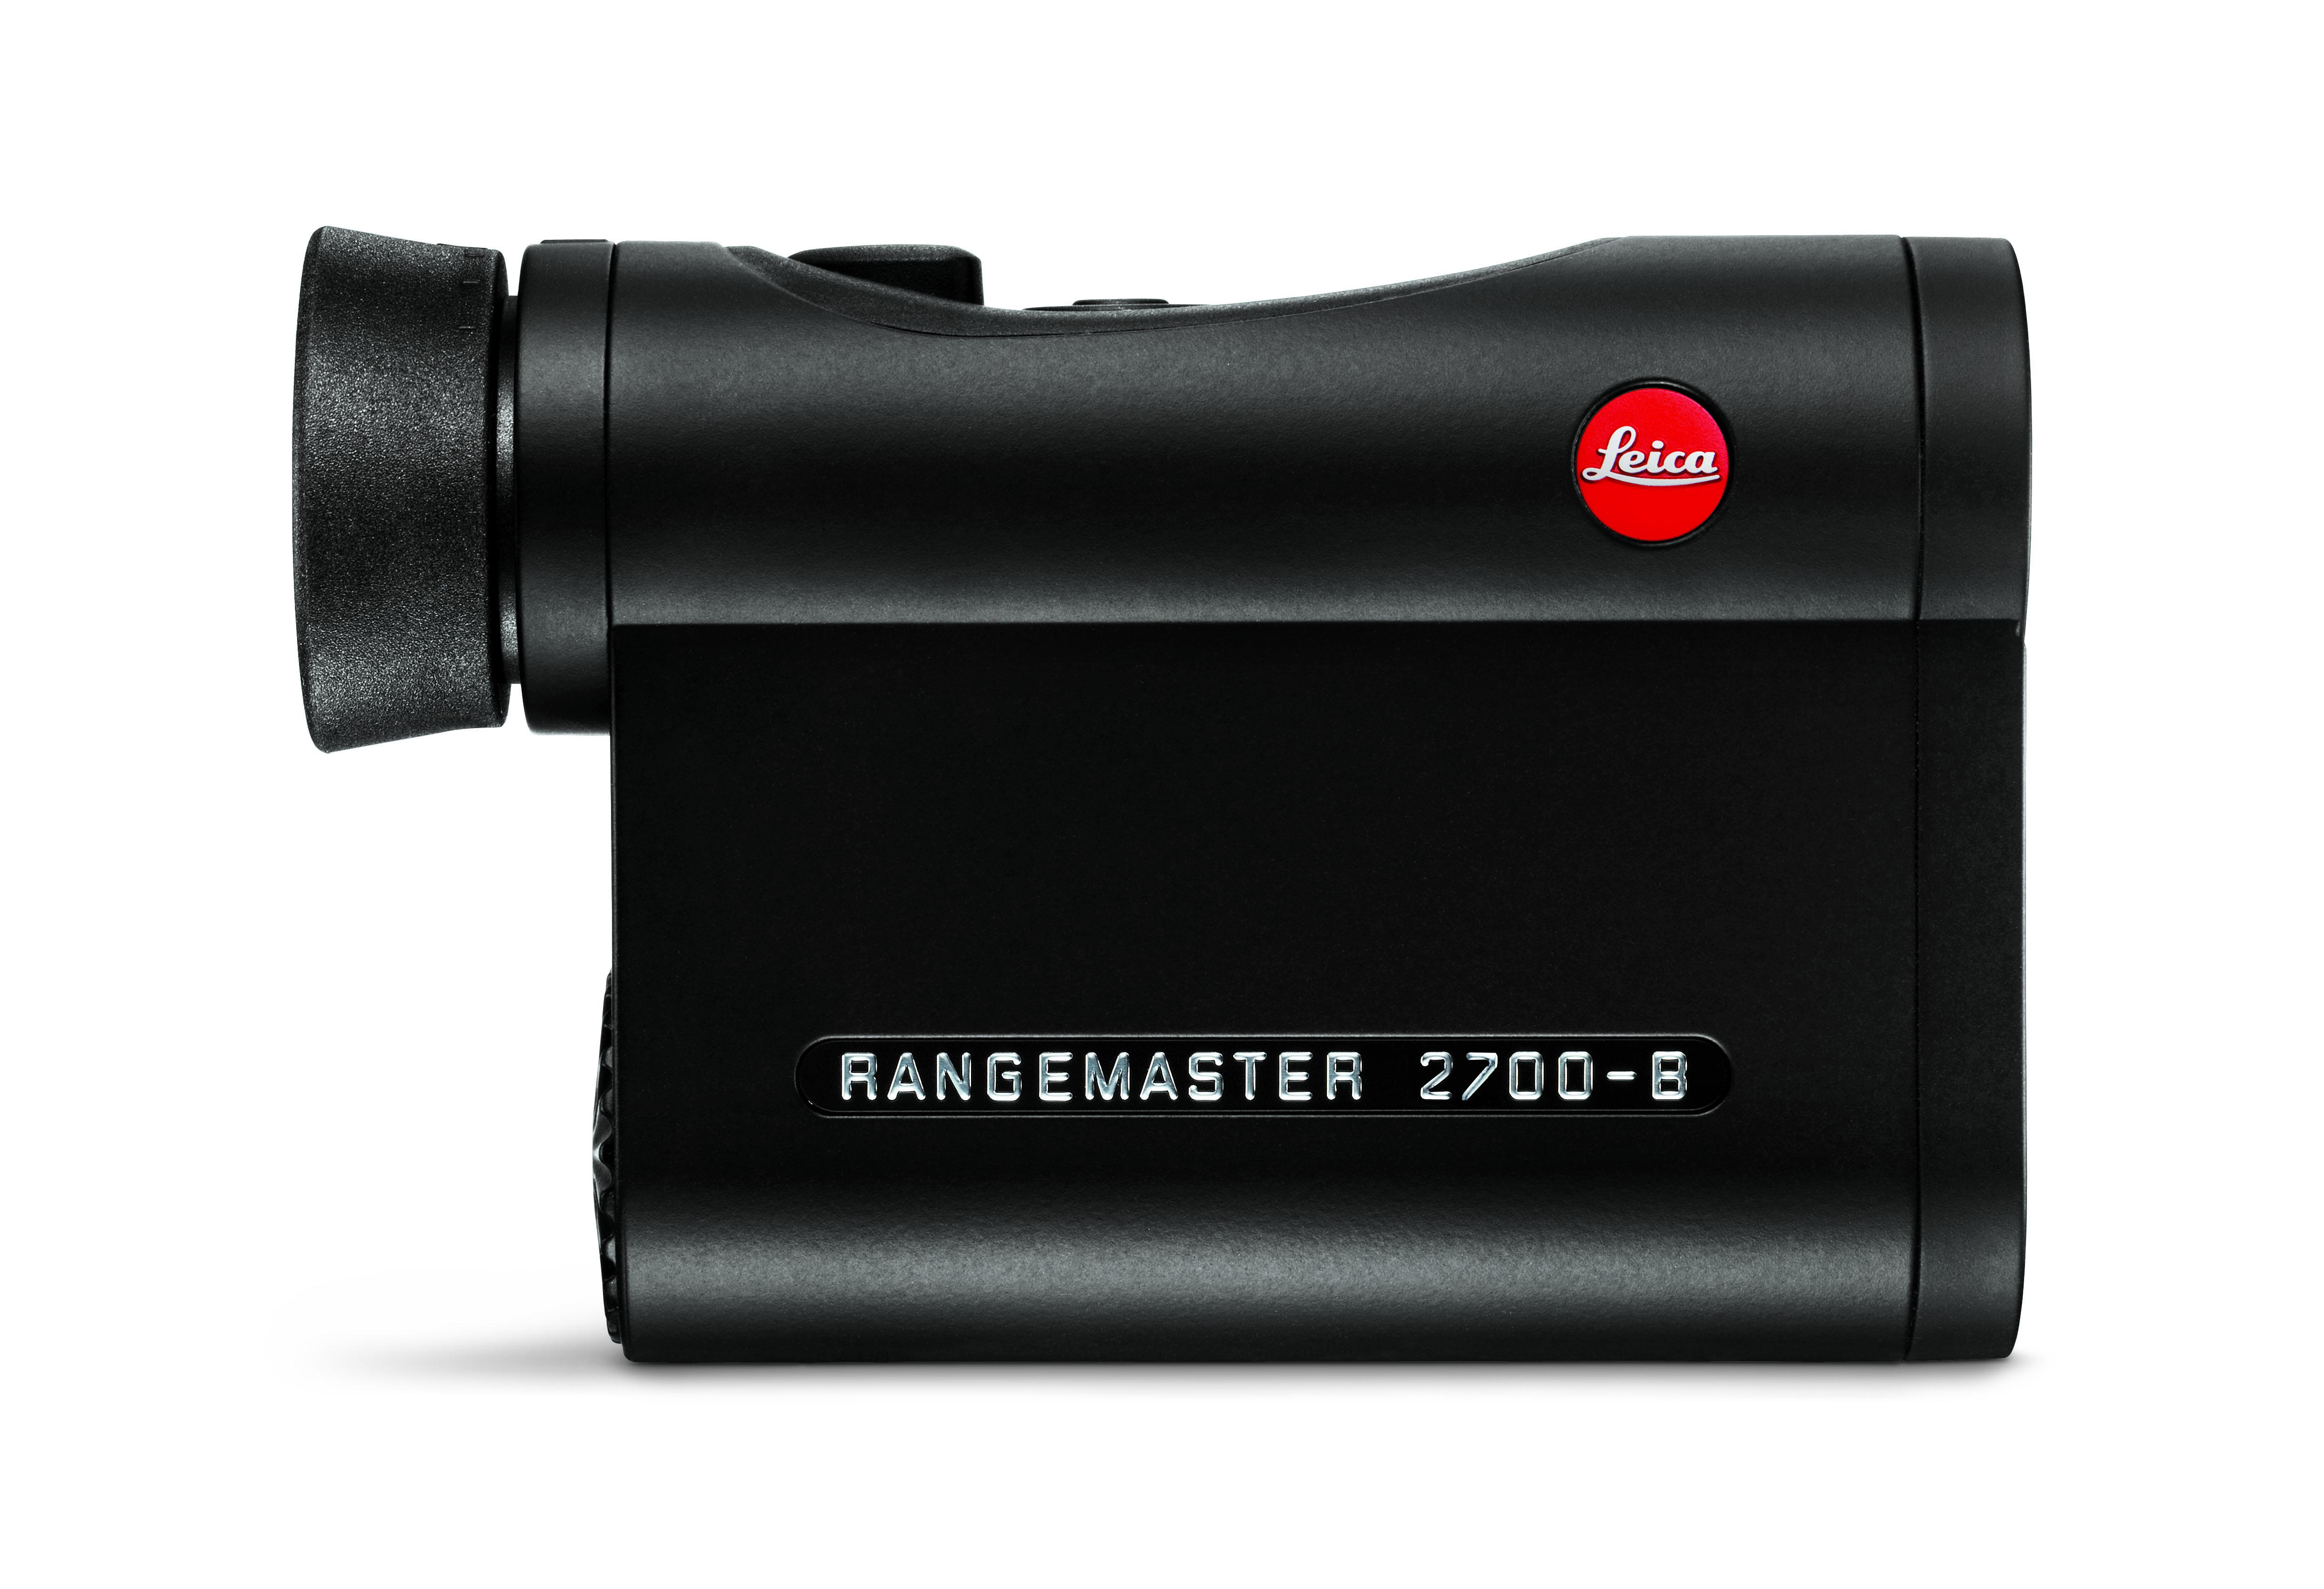 Rangemaster CRF_2700-B_right